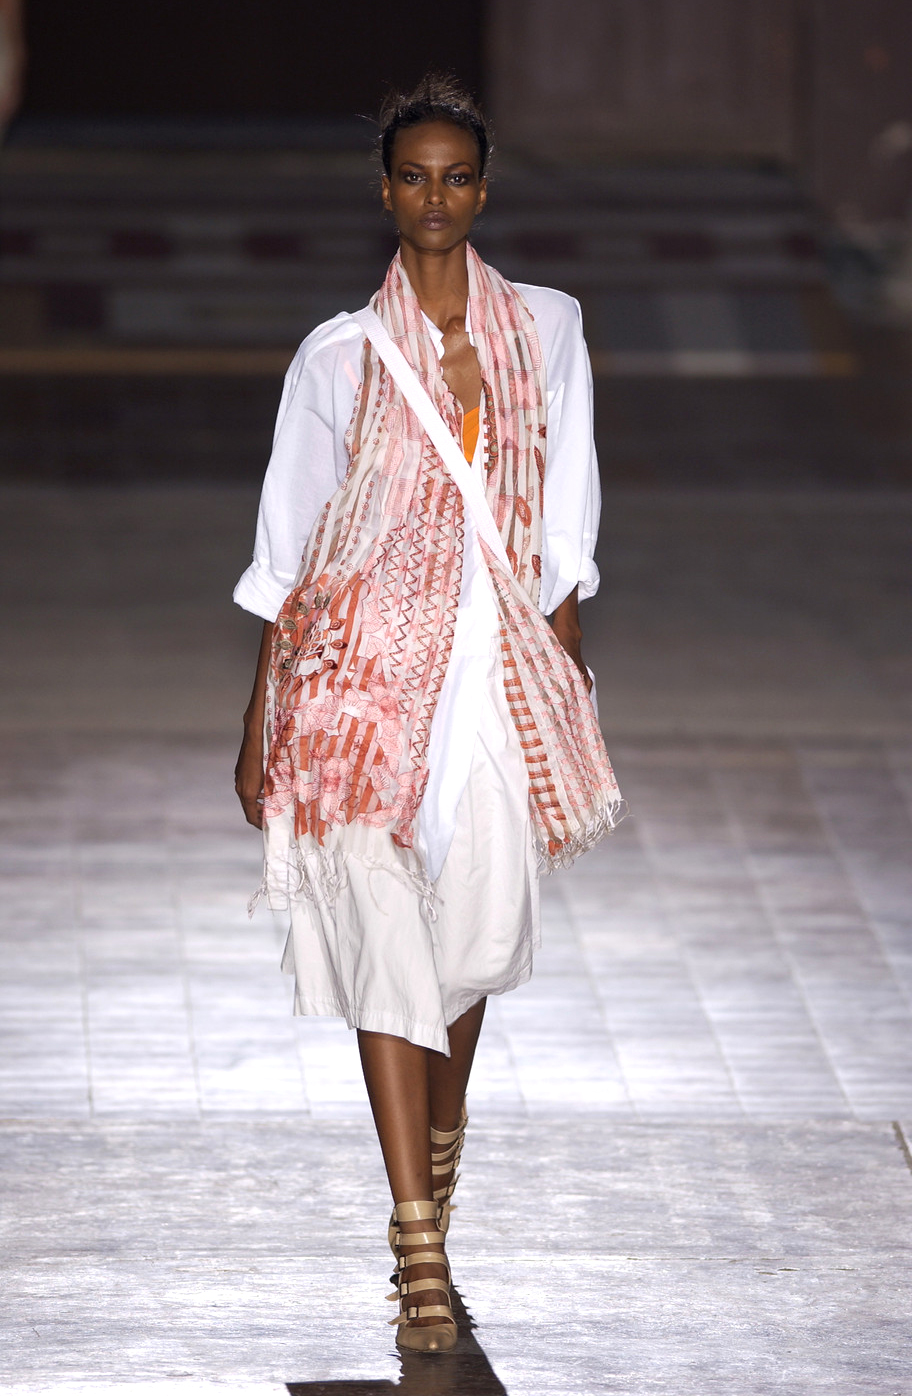 Dries van Noten Spring/Summer 2003 ready to wear collection | Yasmin Warsame